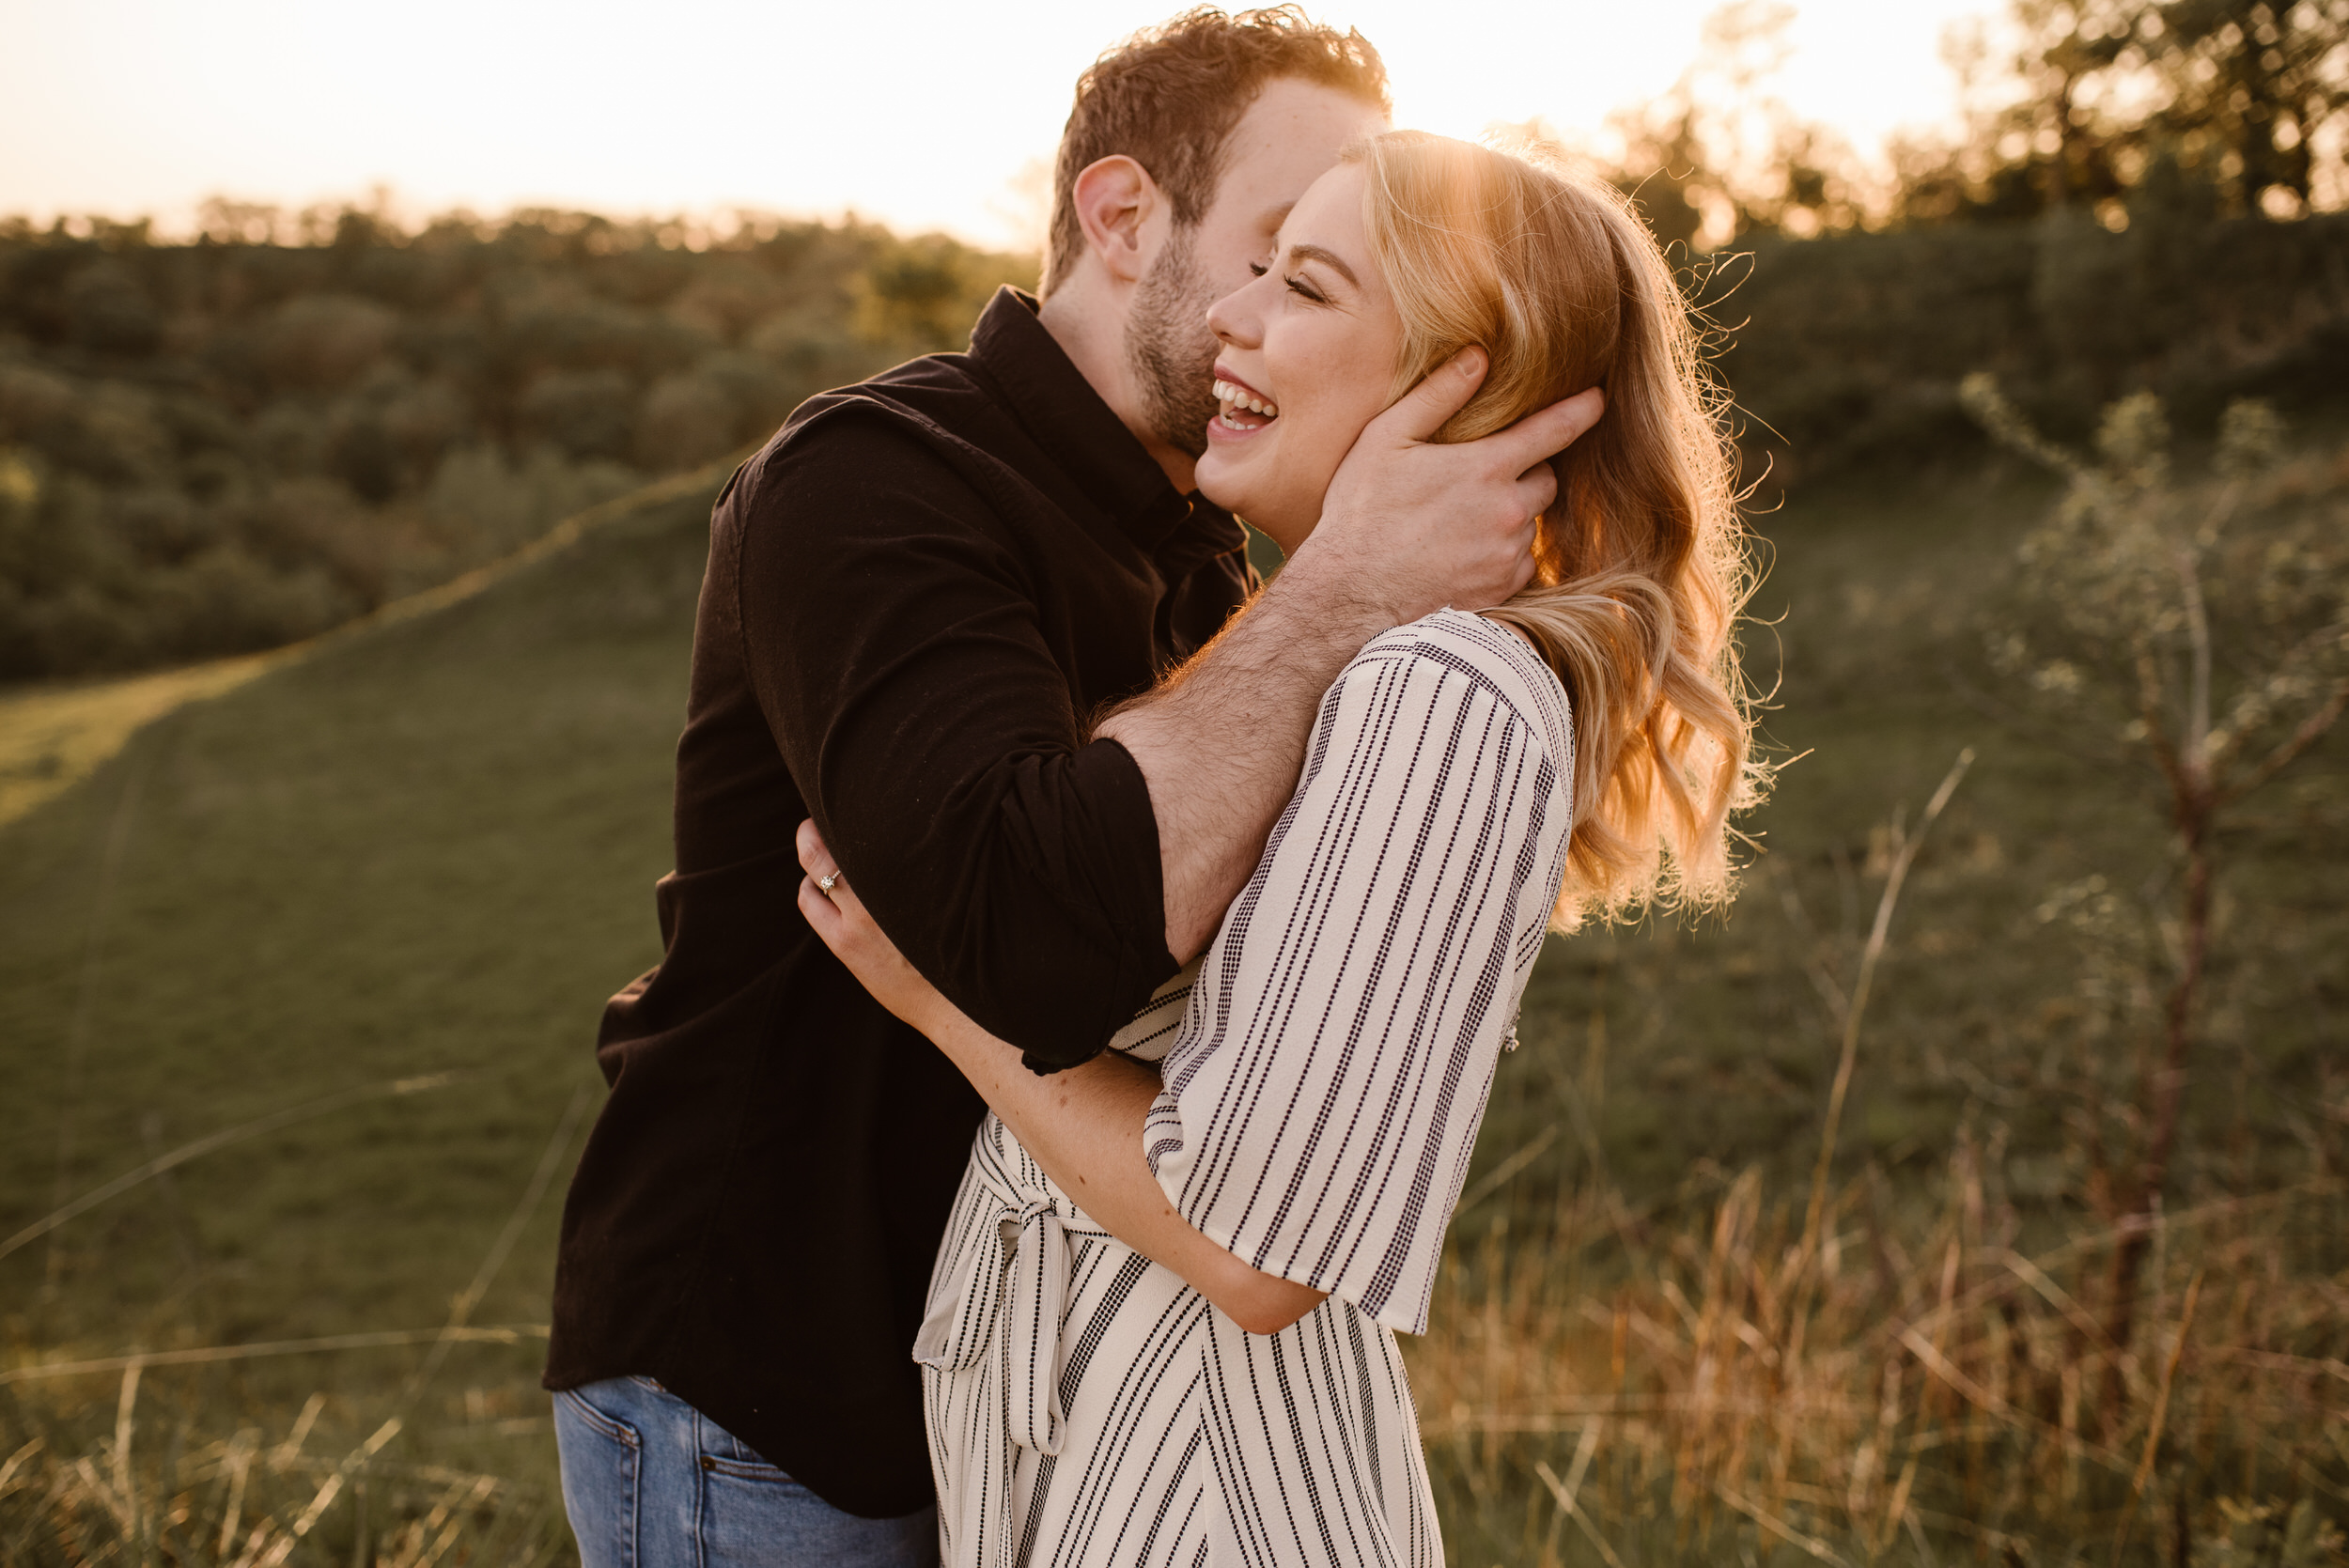 Omaha-Nebraska-Engagement-Session-Kaylie-Sirek-Photography-137.jpg